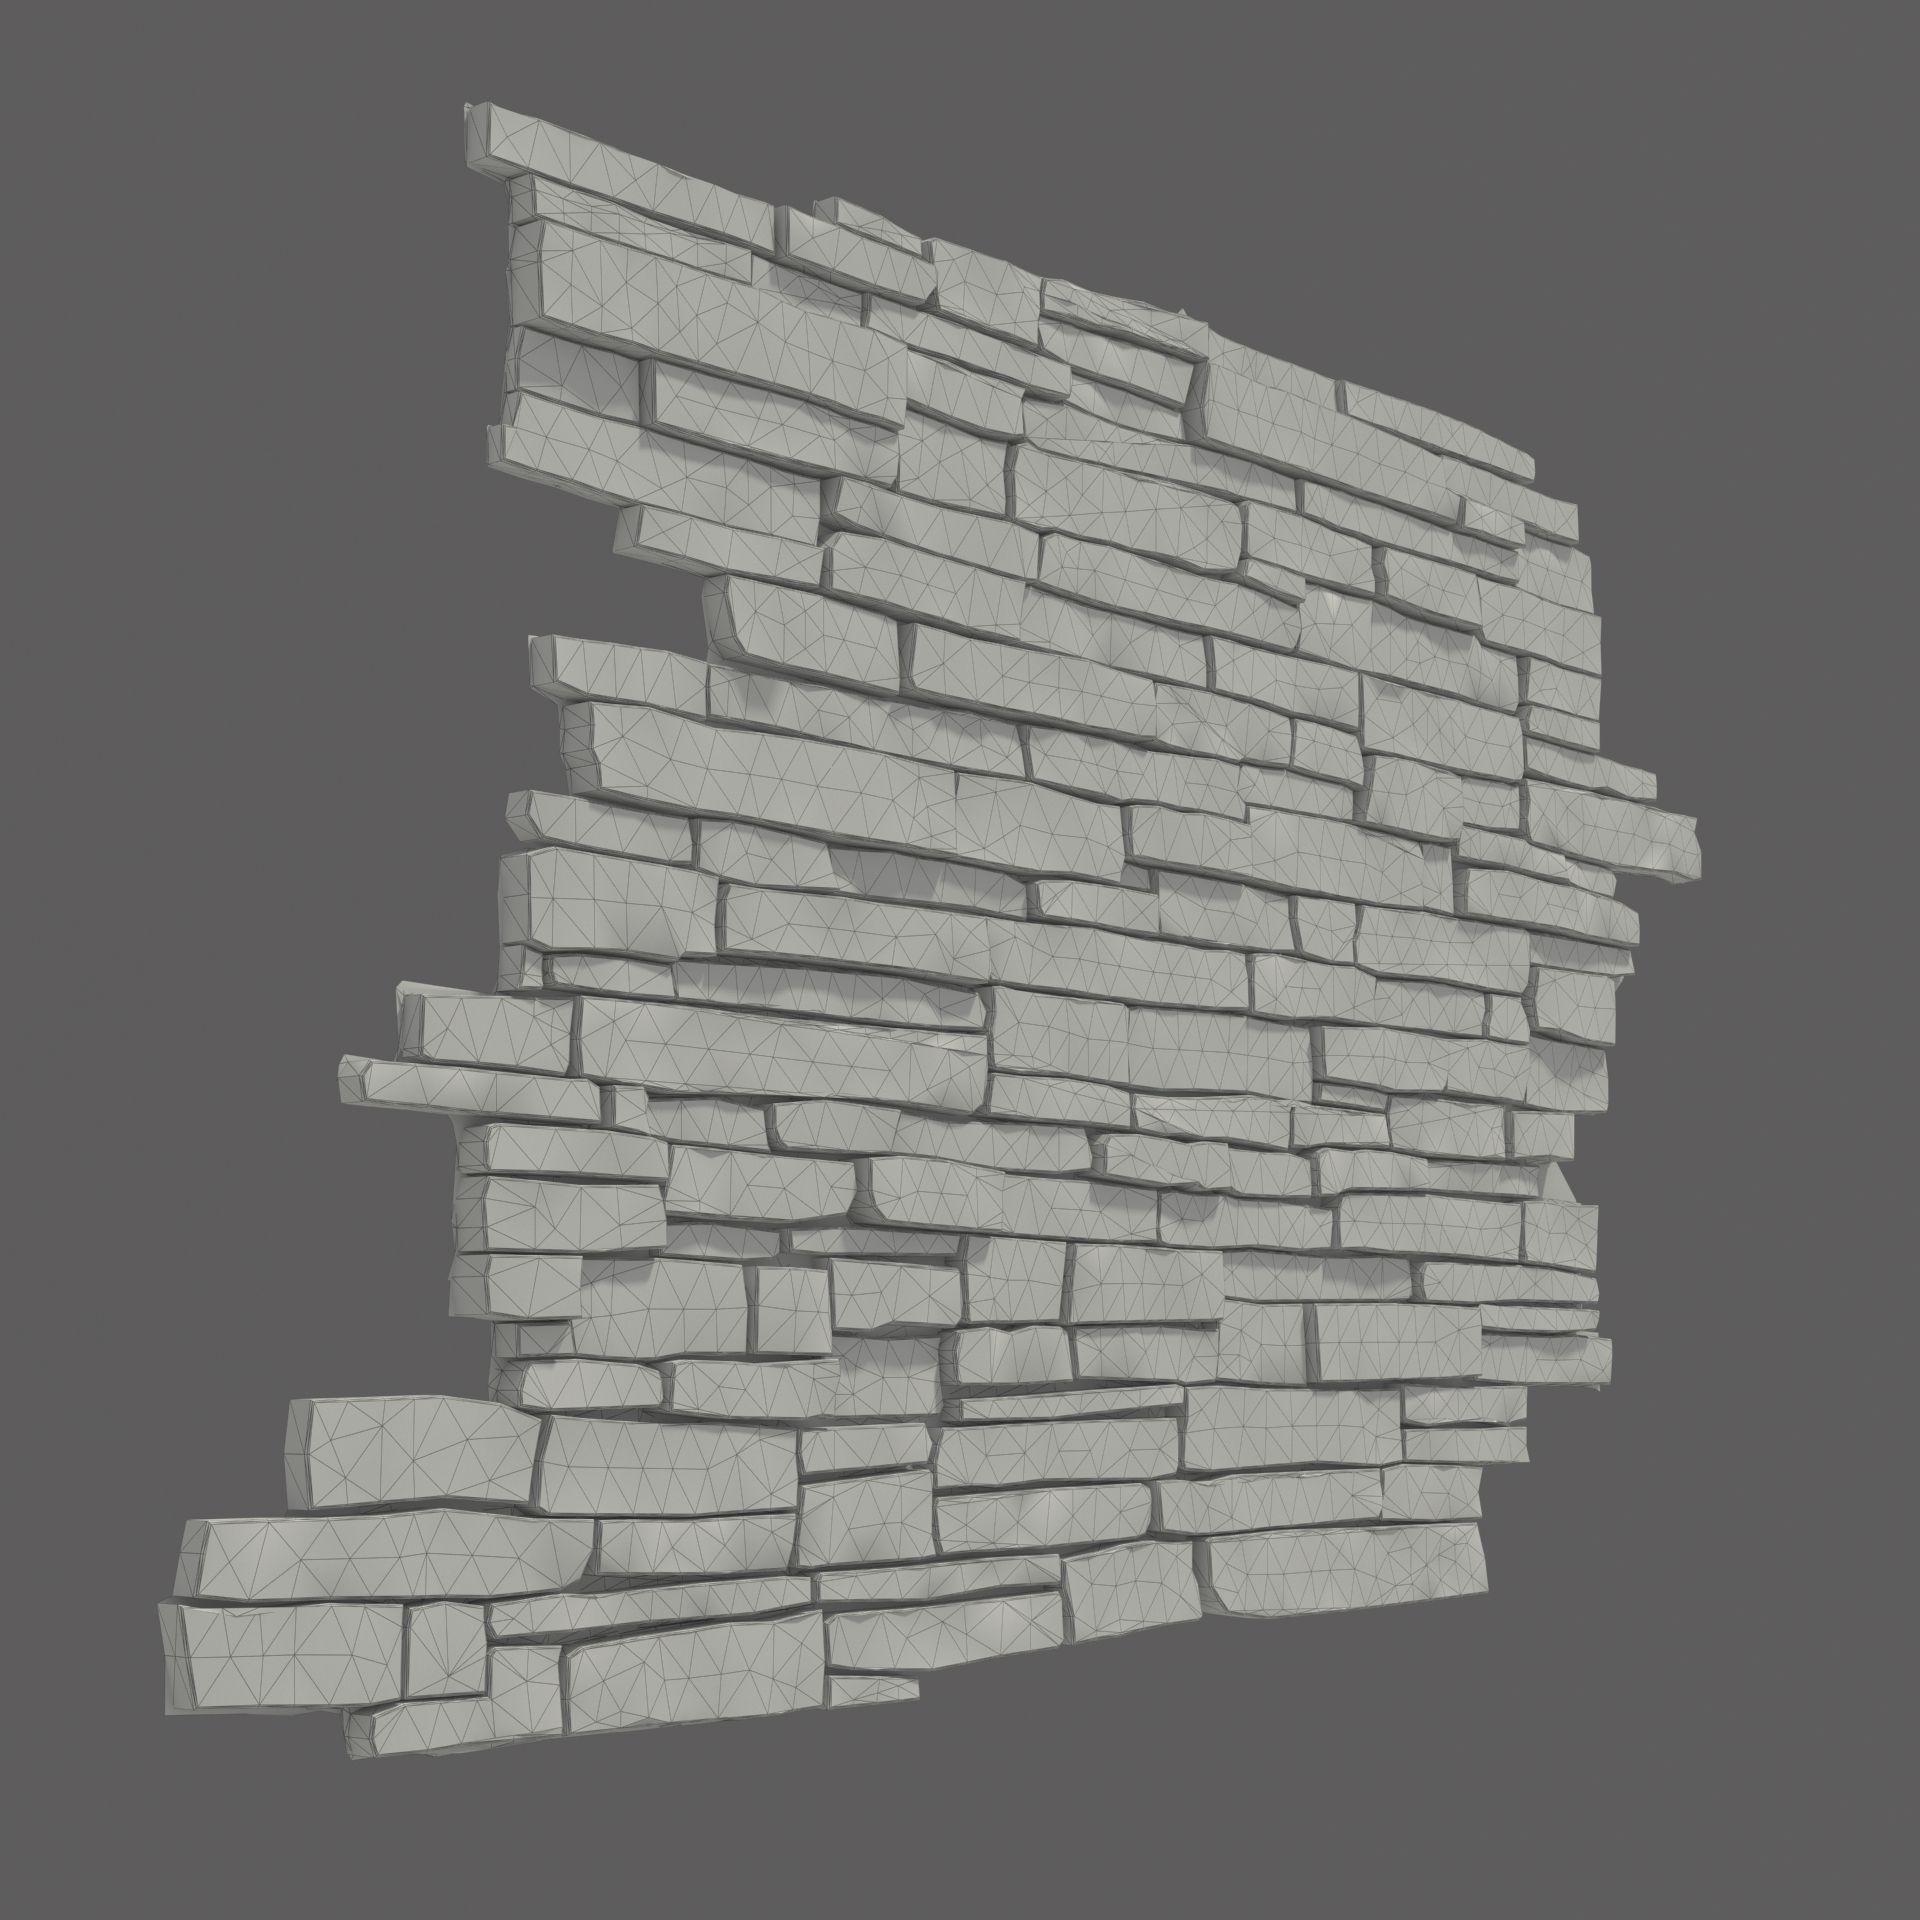 Wall Decoration 3d Model Free Download : Masonry stone wall d model max obj fbx cgtrader